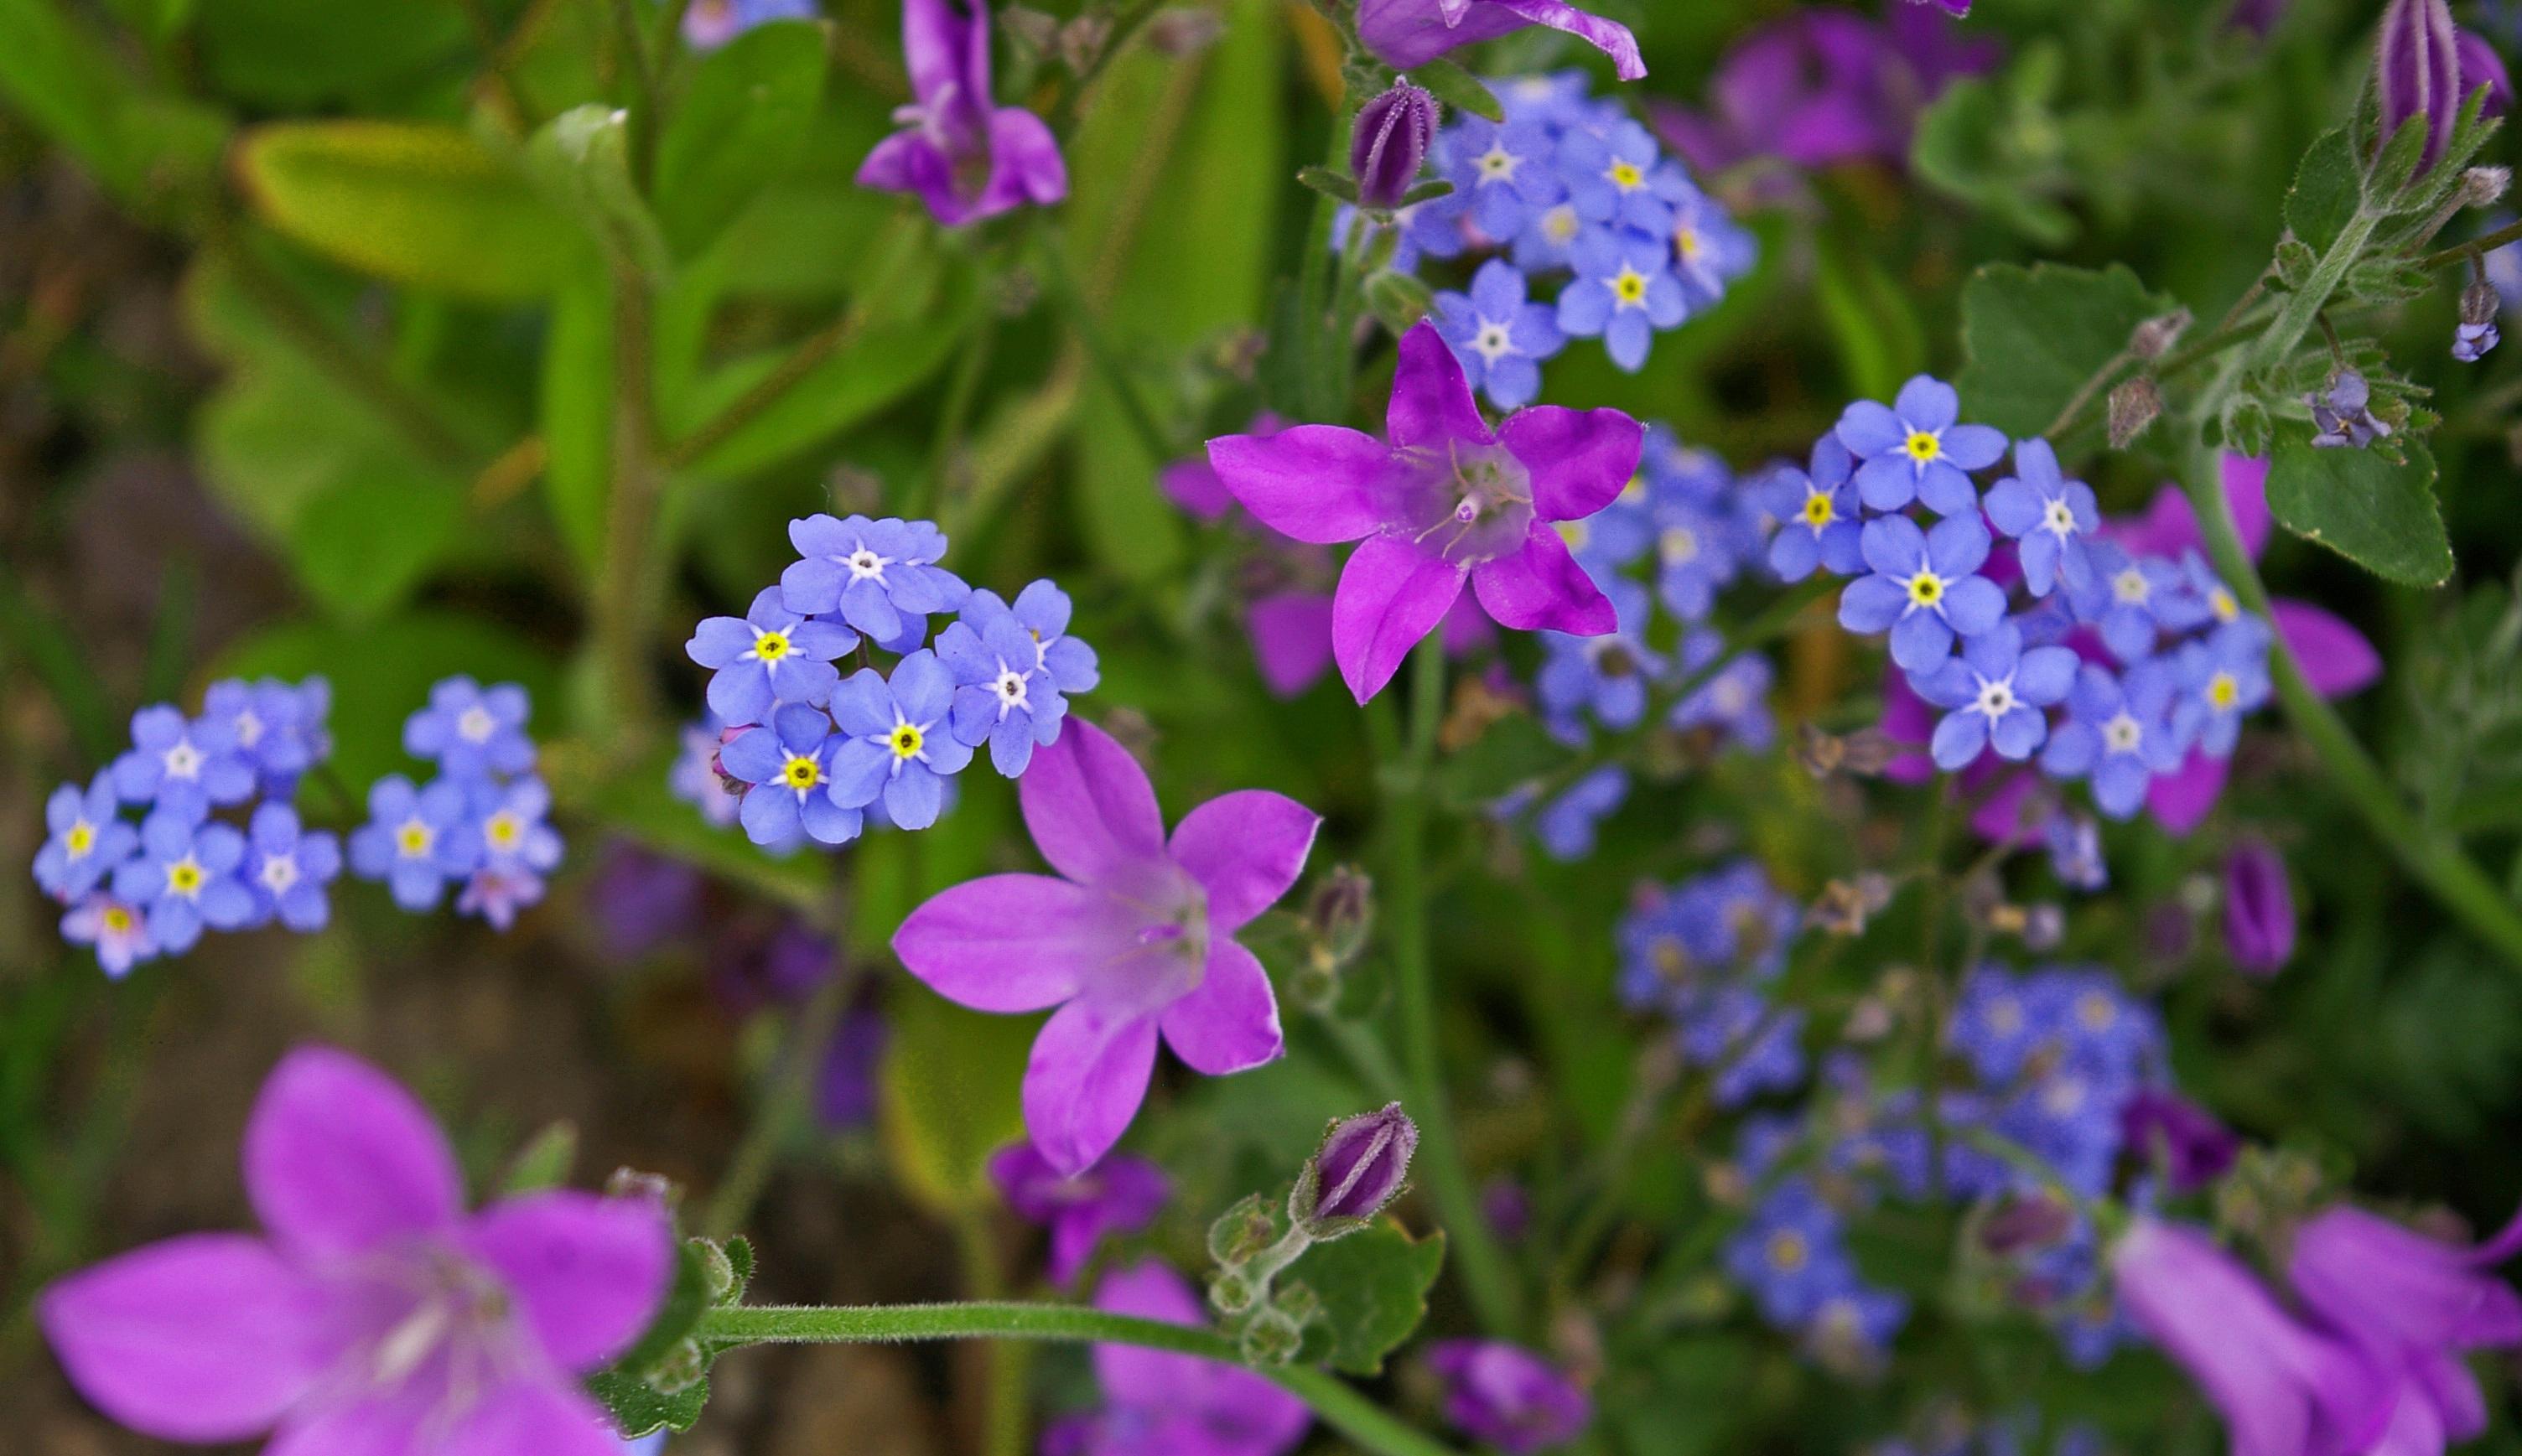 Free Images Nature Blossom Bloom Summer Herb Botany Flora